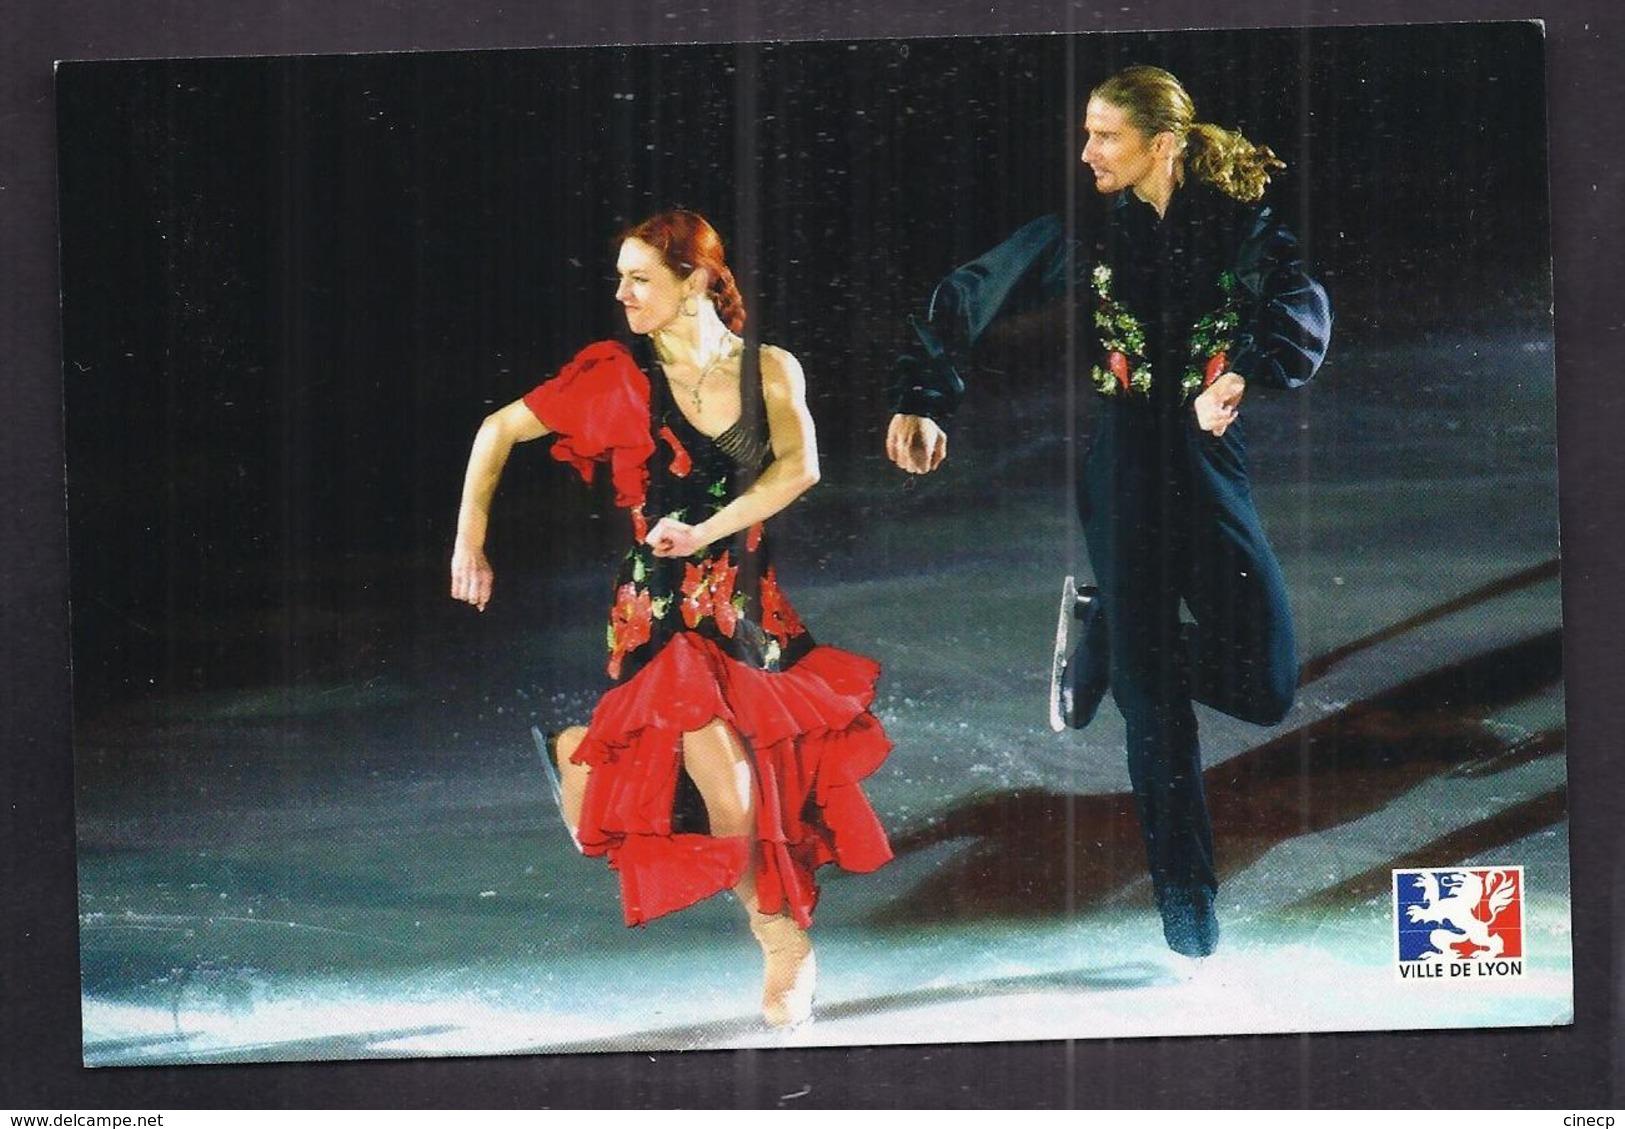 CPSM SPORT - DANSE SUR GLACE - Marina ANISSINA + Gwendal PEIZERAT Champion Olympique 2002 Jeux Olympiques - Patinage Artistique